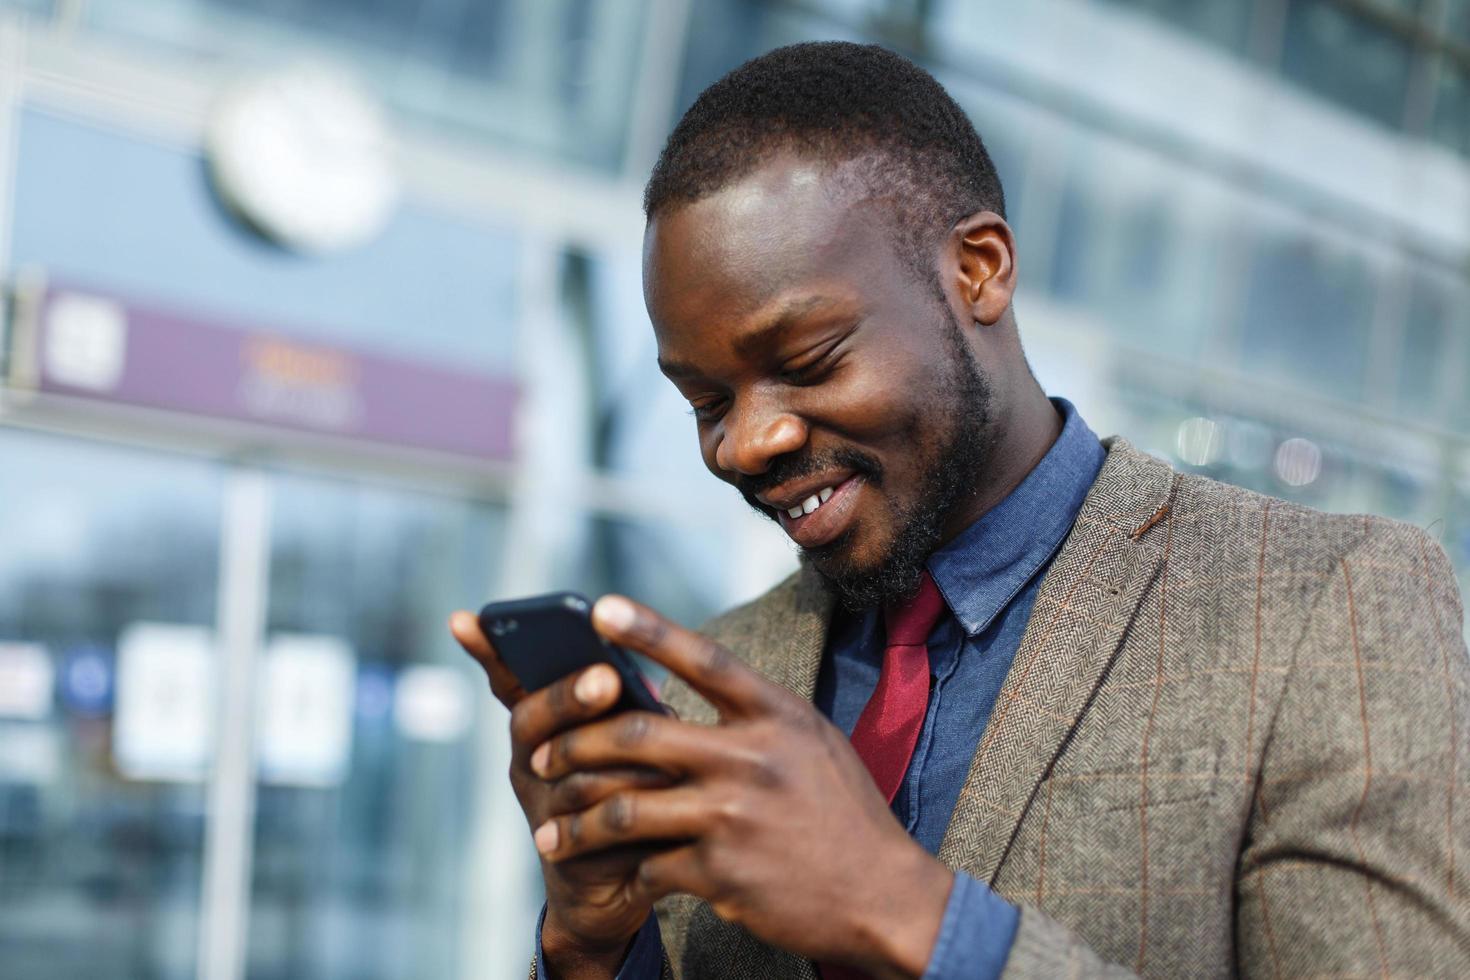 Man smiling while texting photo